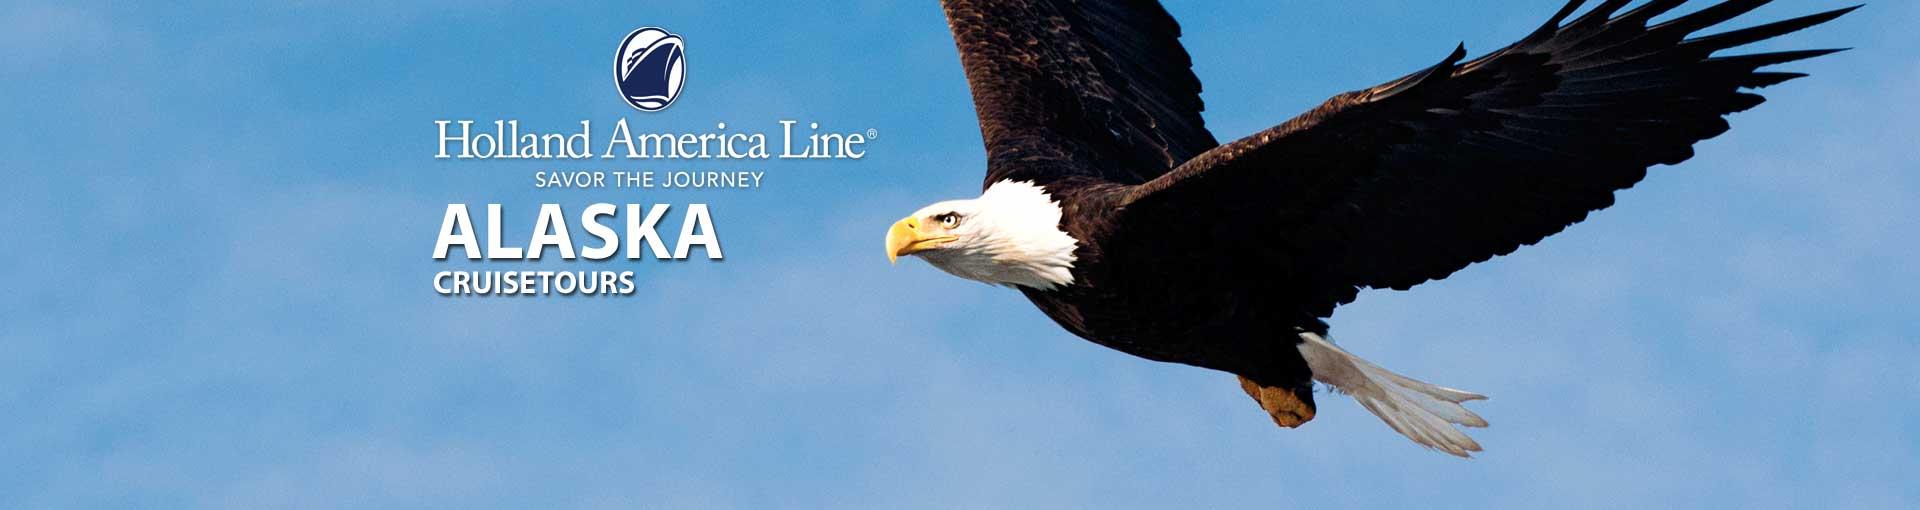 Holland America Alaska Cruisetours